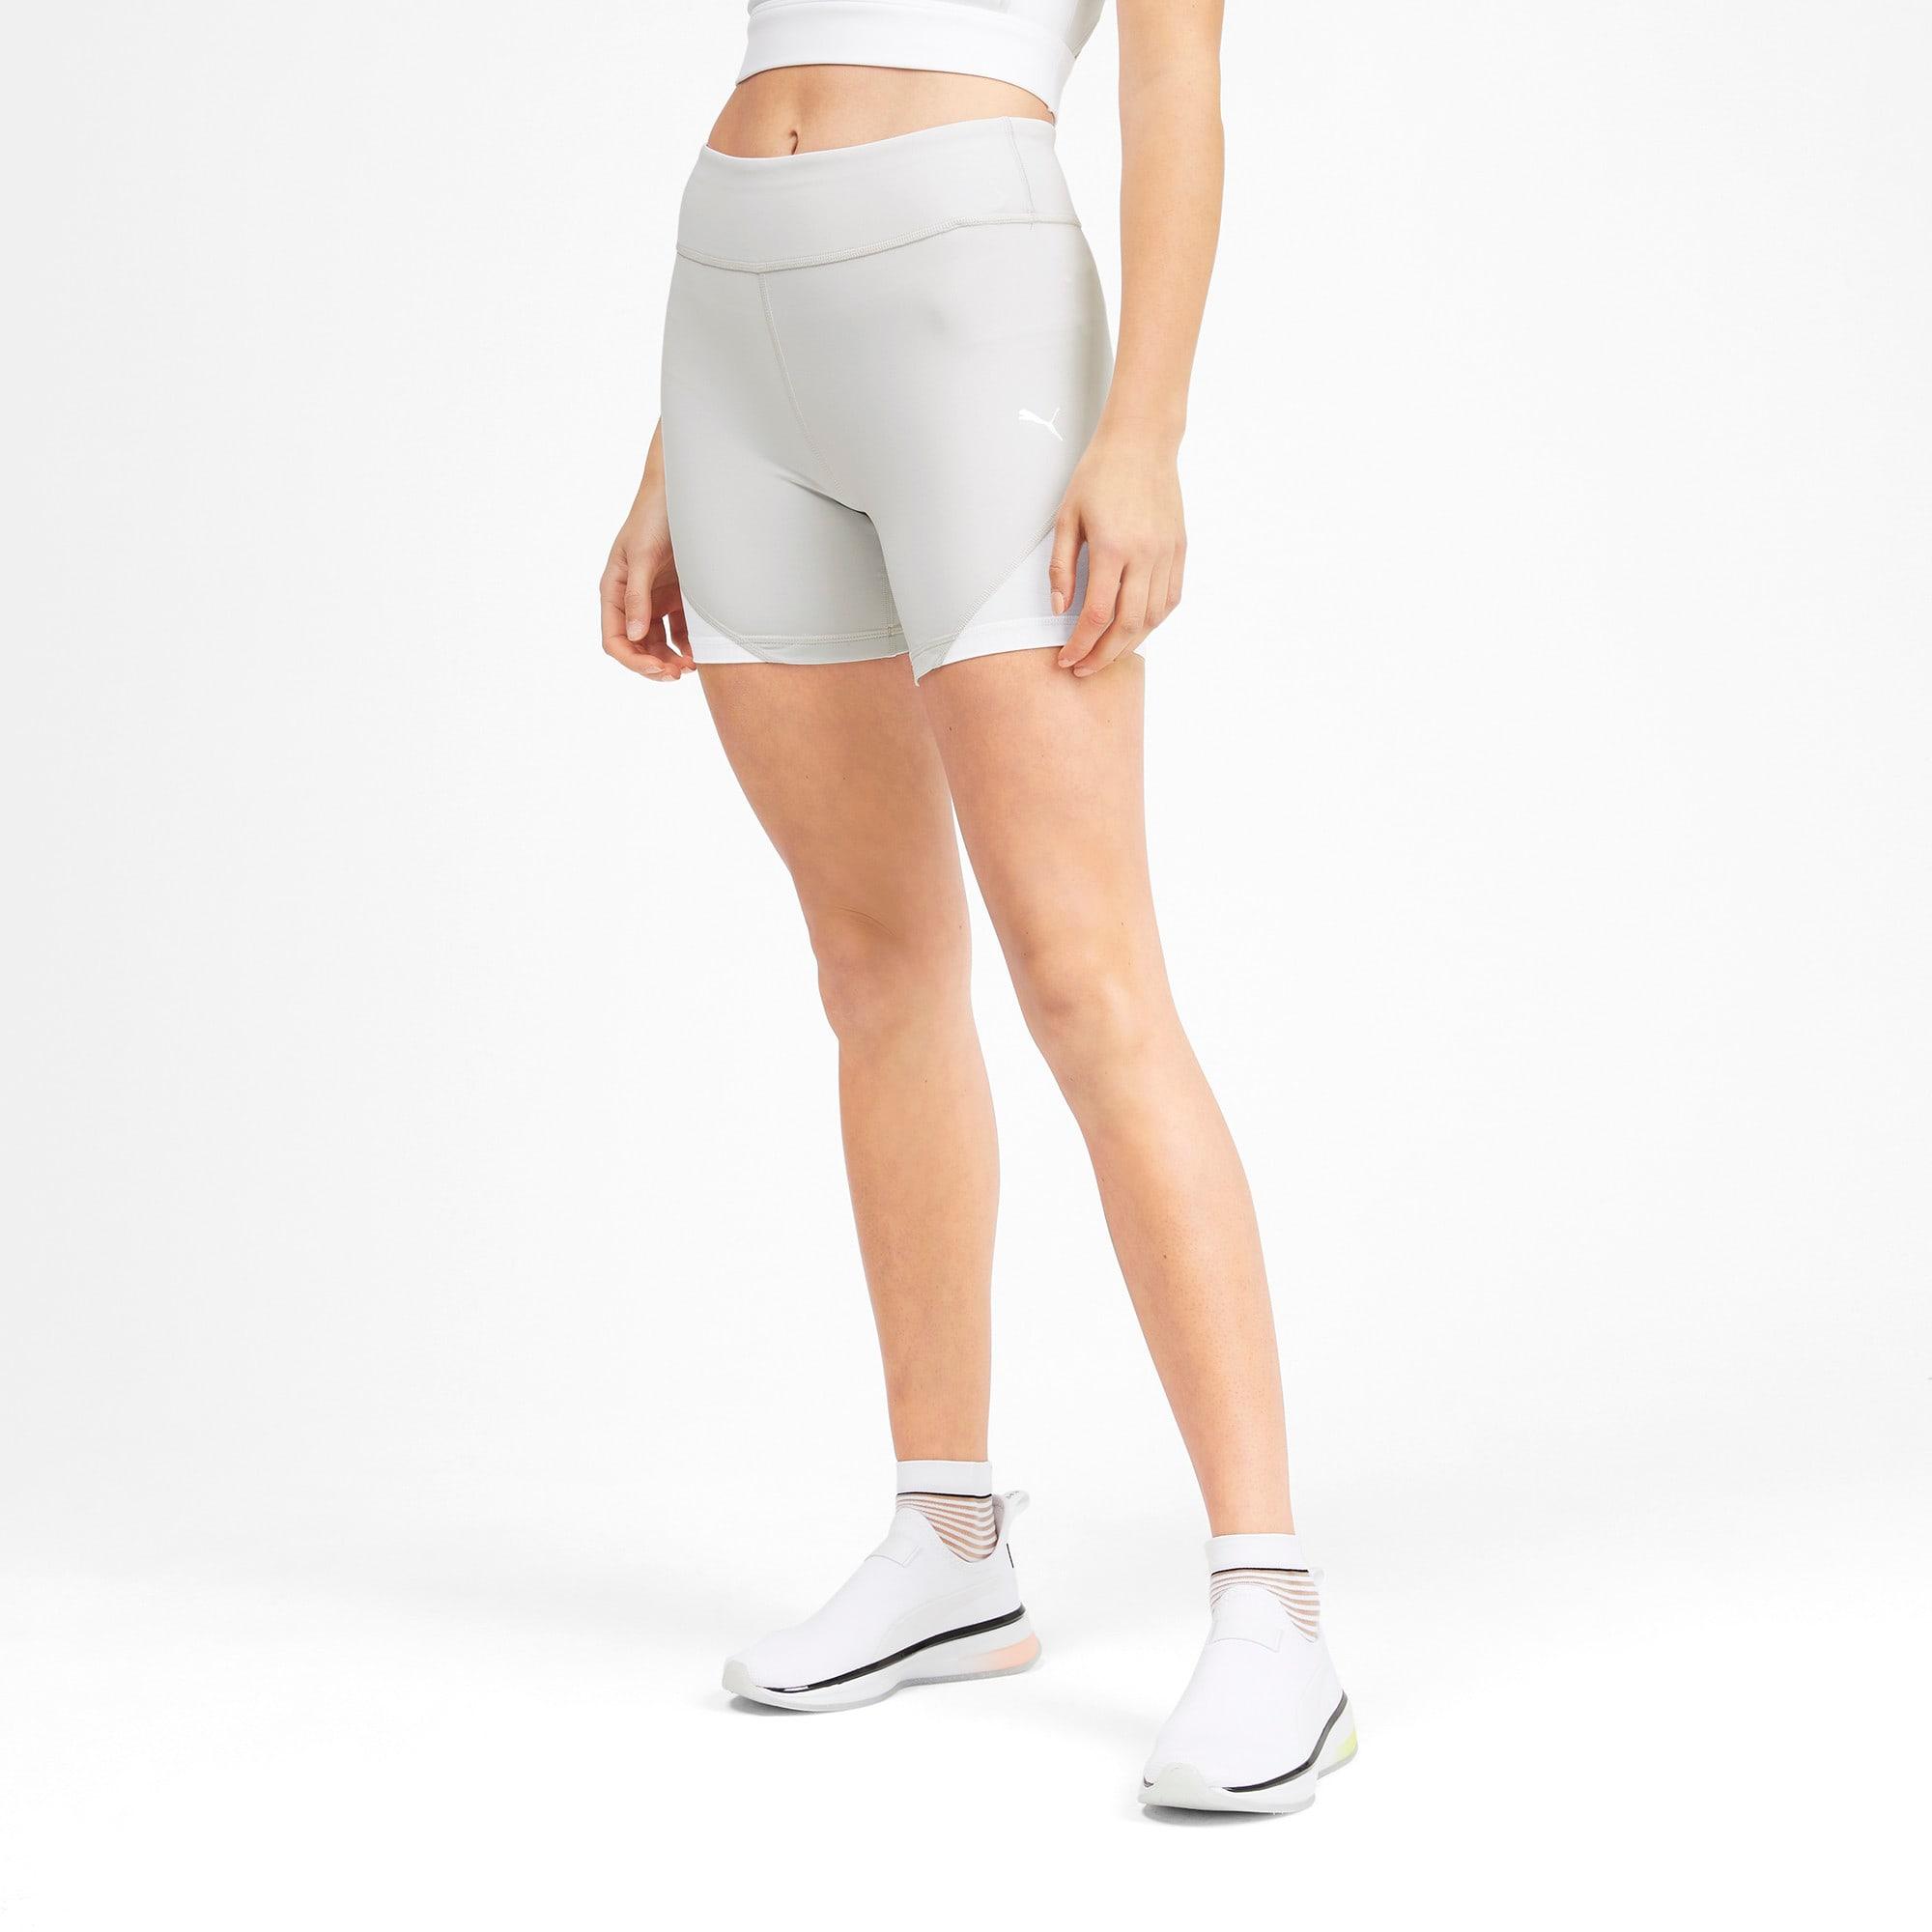 Miniatura 1 de Shorts SG x PUMA, Glacier Gray-Puma White, mediano